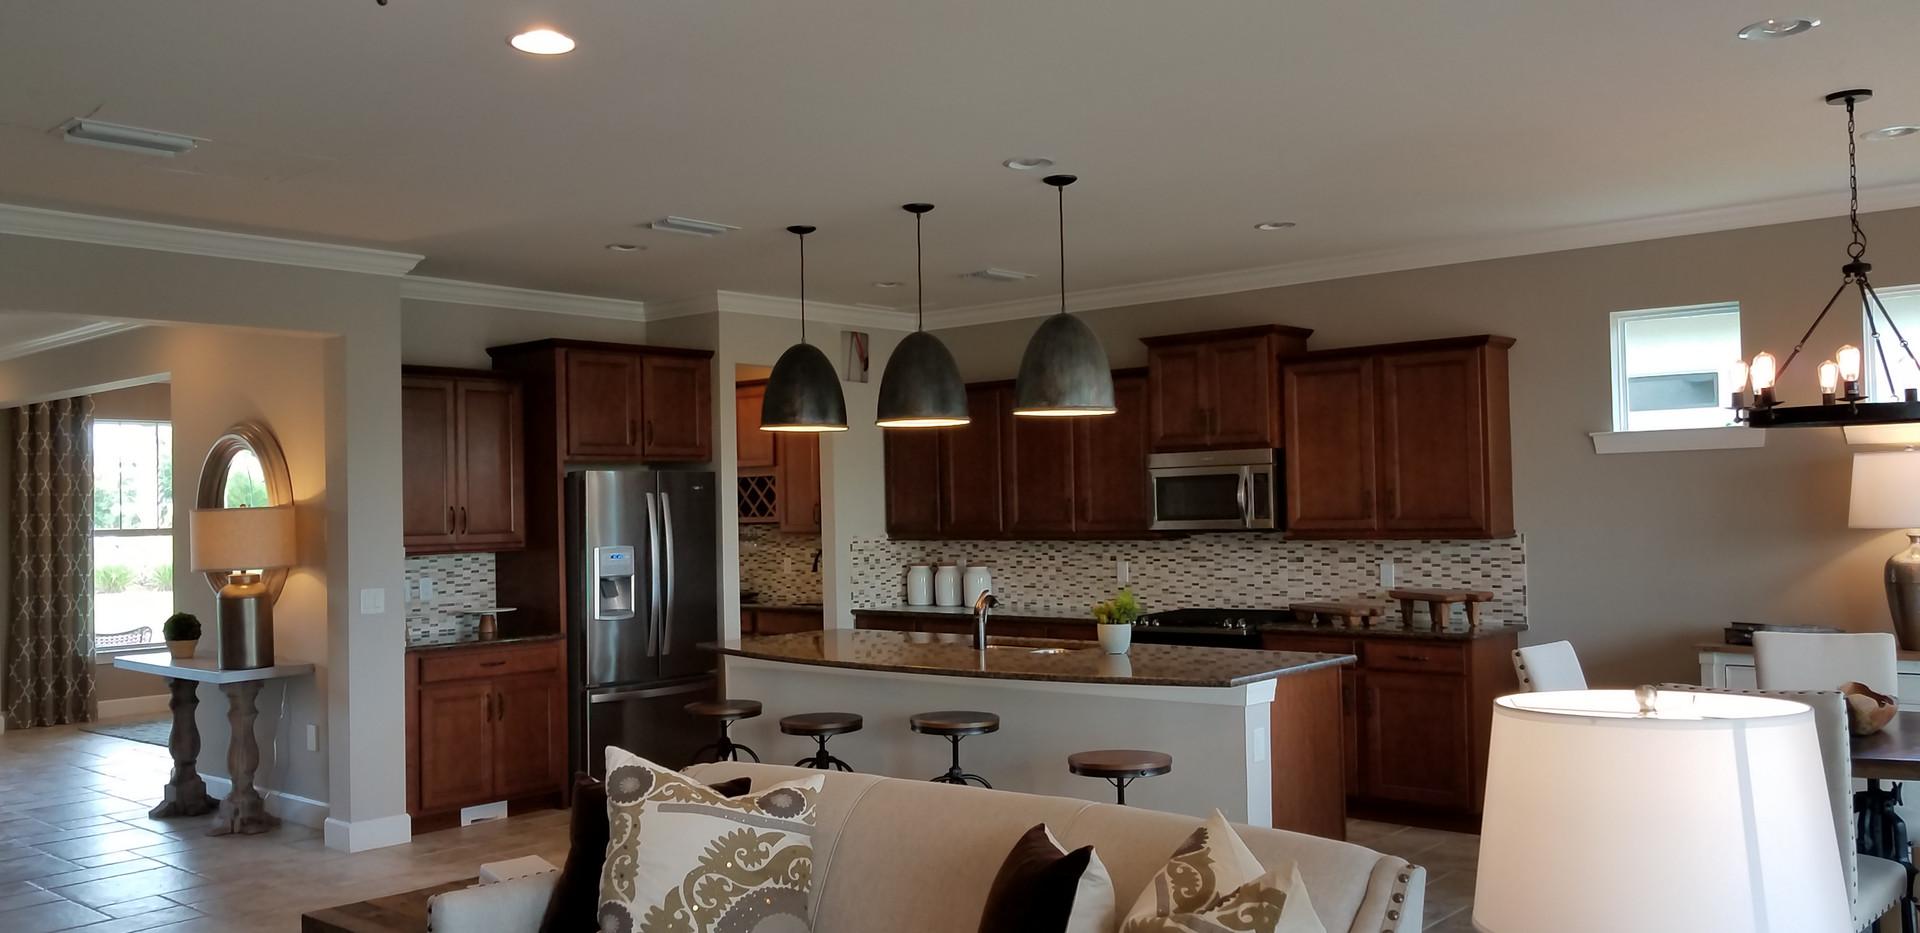 Mallory Park Lakewood Ranch model home